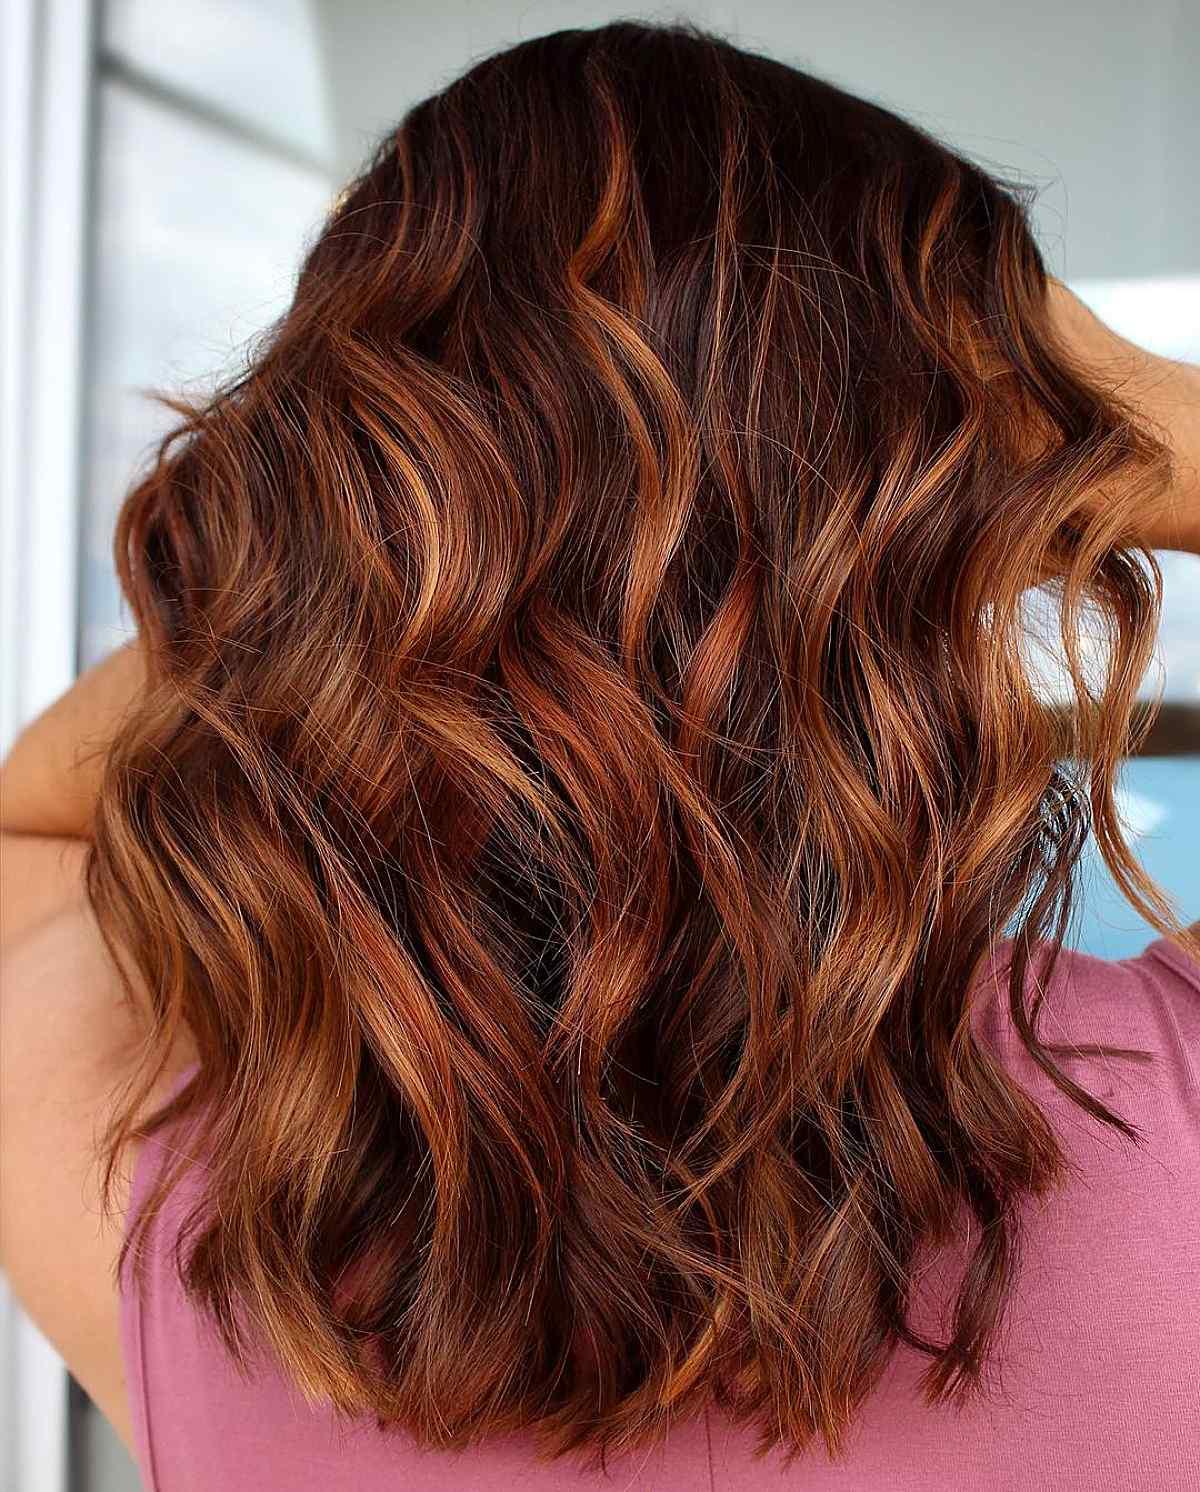 Crisp apple cider fall hair color